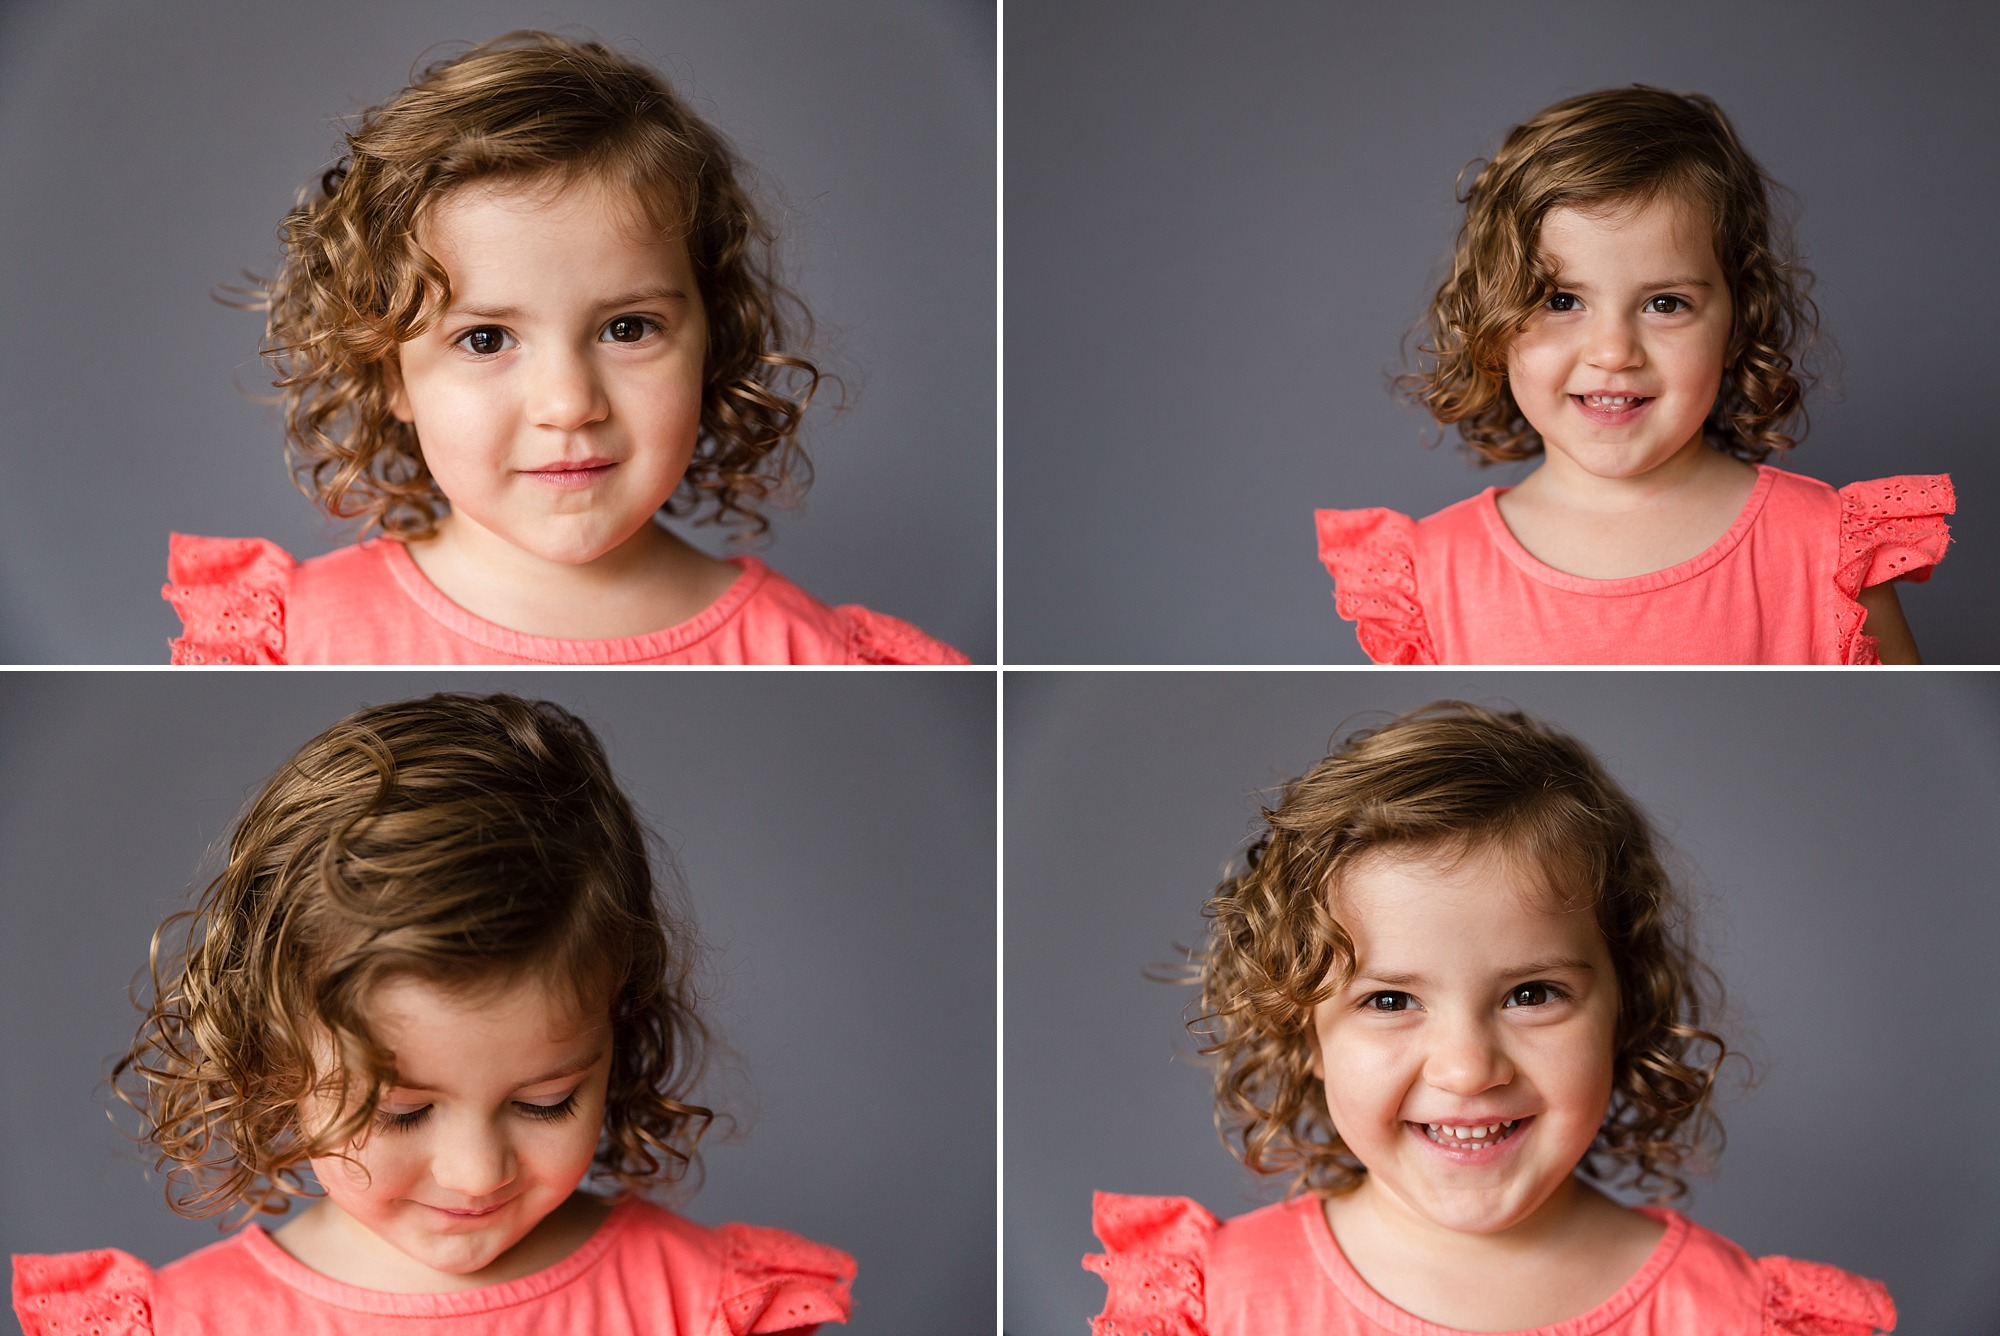 Modern_Childrens_Portraits_Hunnicutt_Photography_Collages_0014